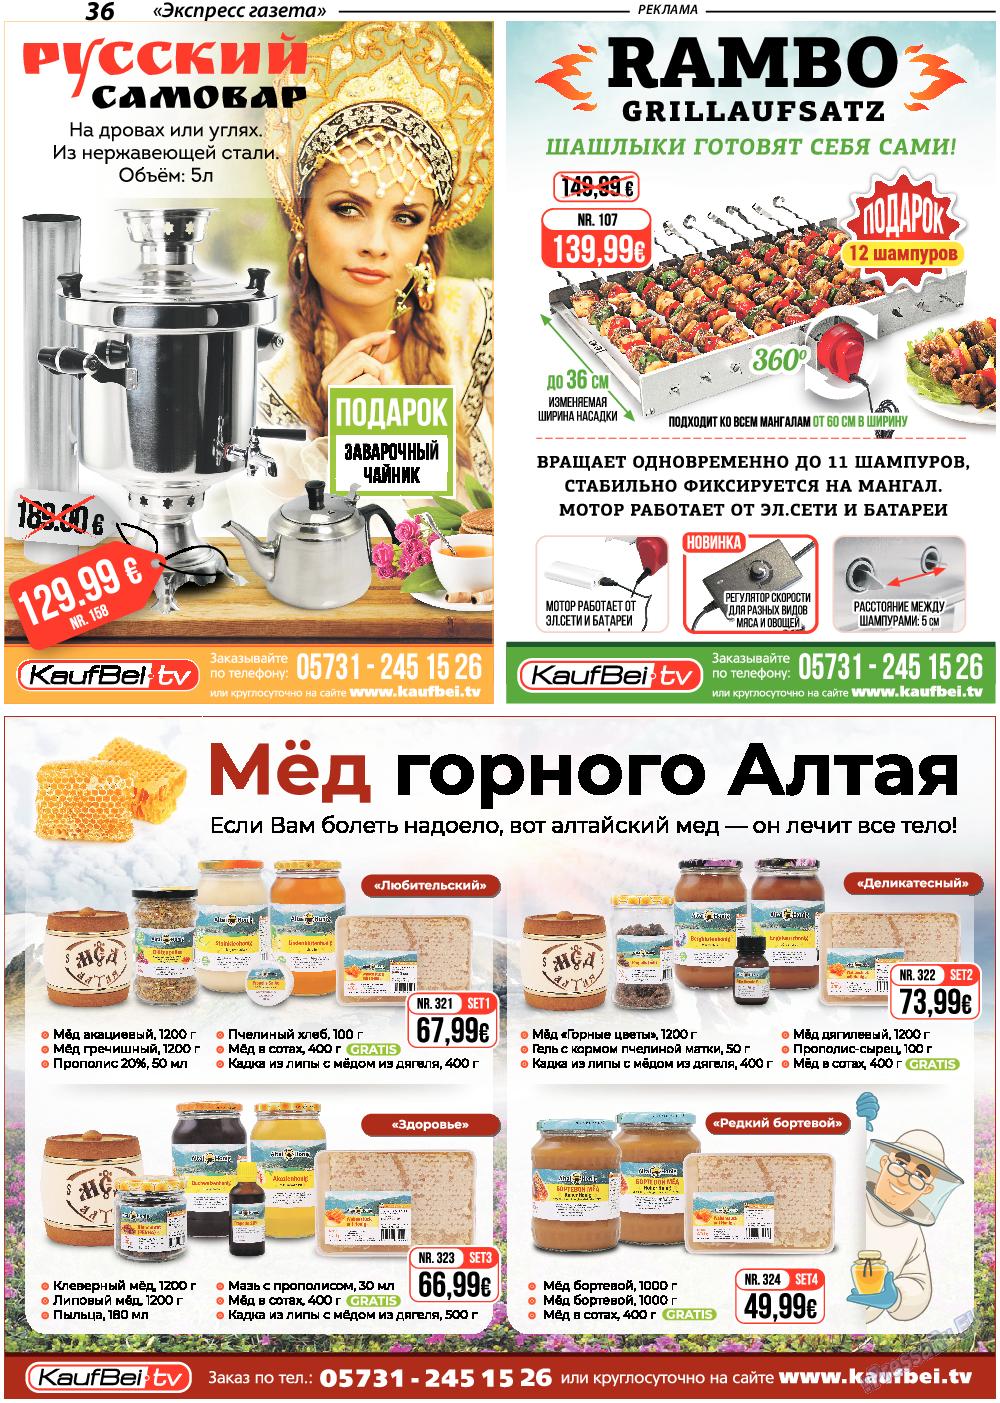 Экспресс газета (газета). 2018 год, номер 10, стр. 36